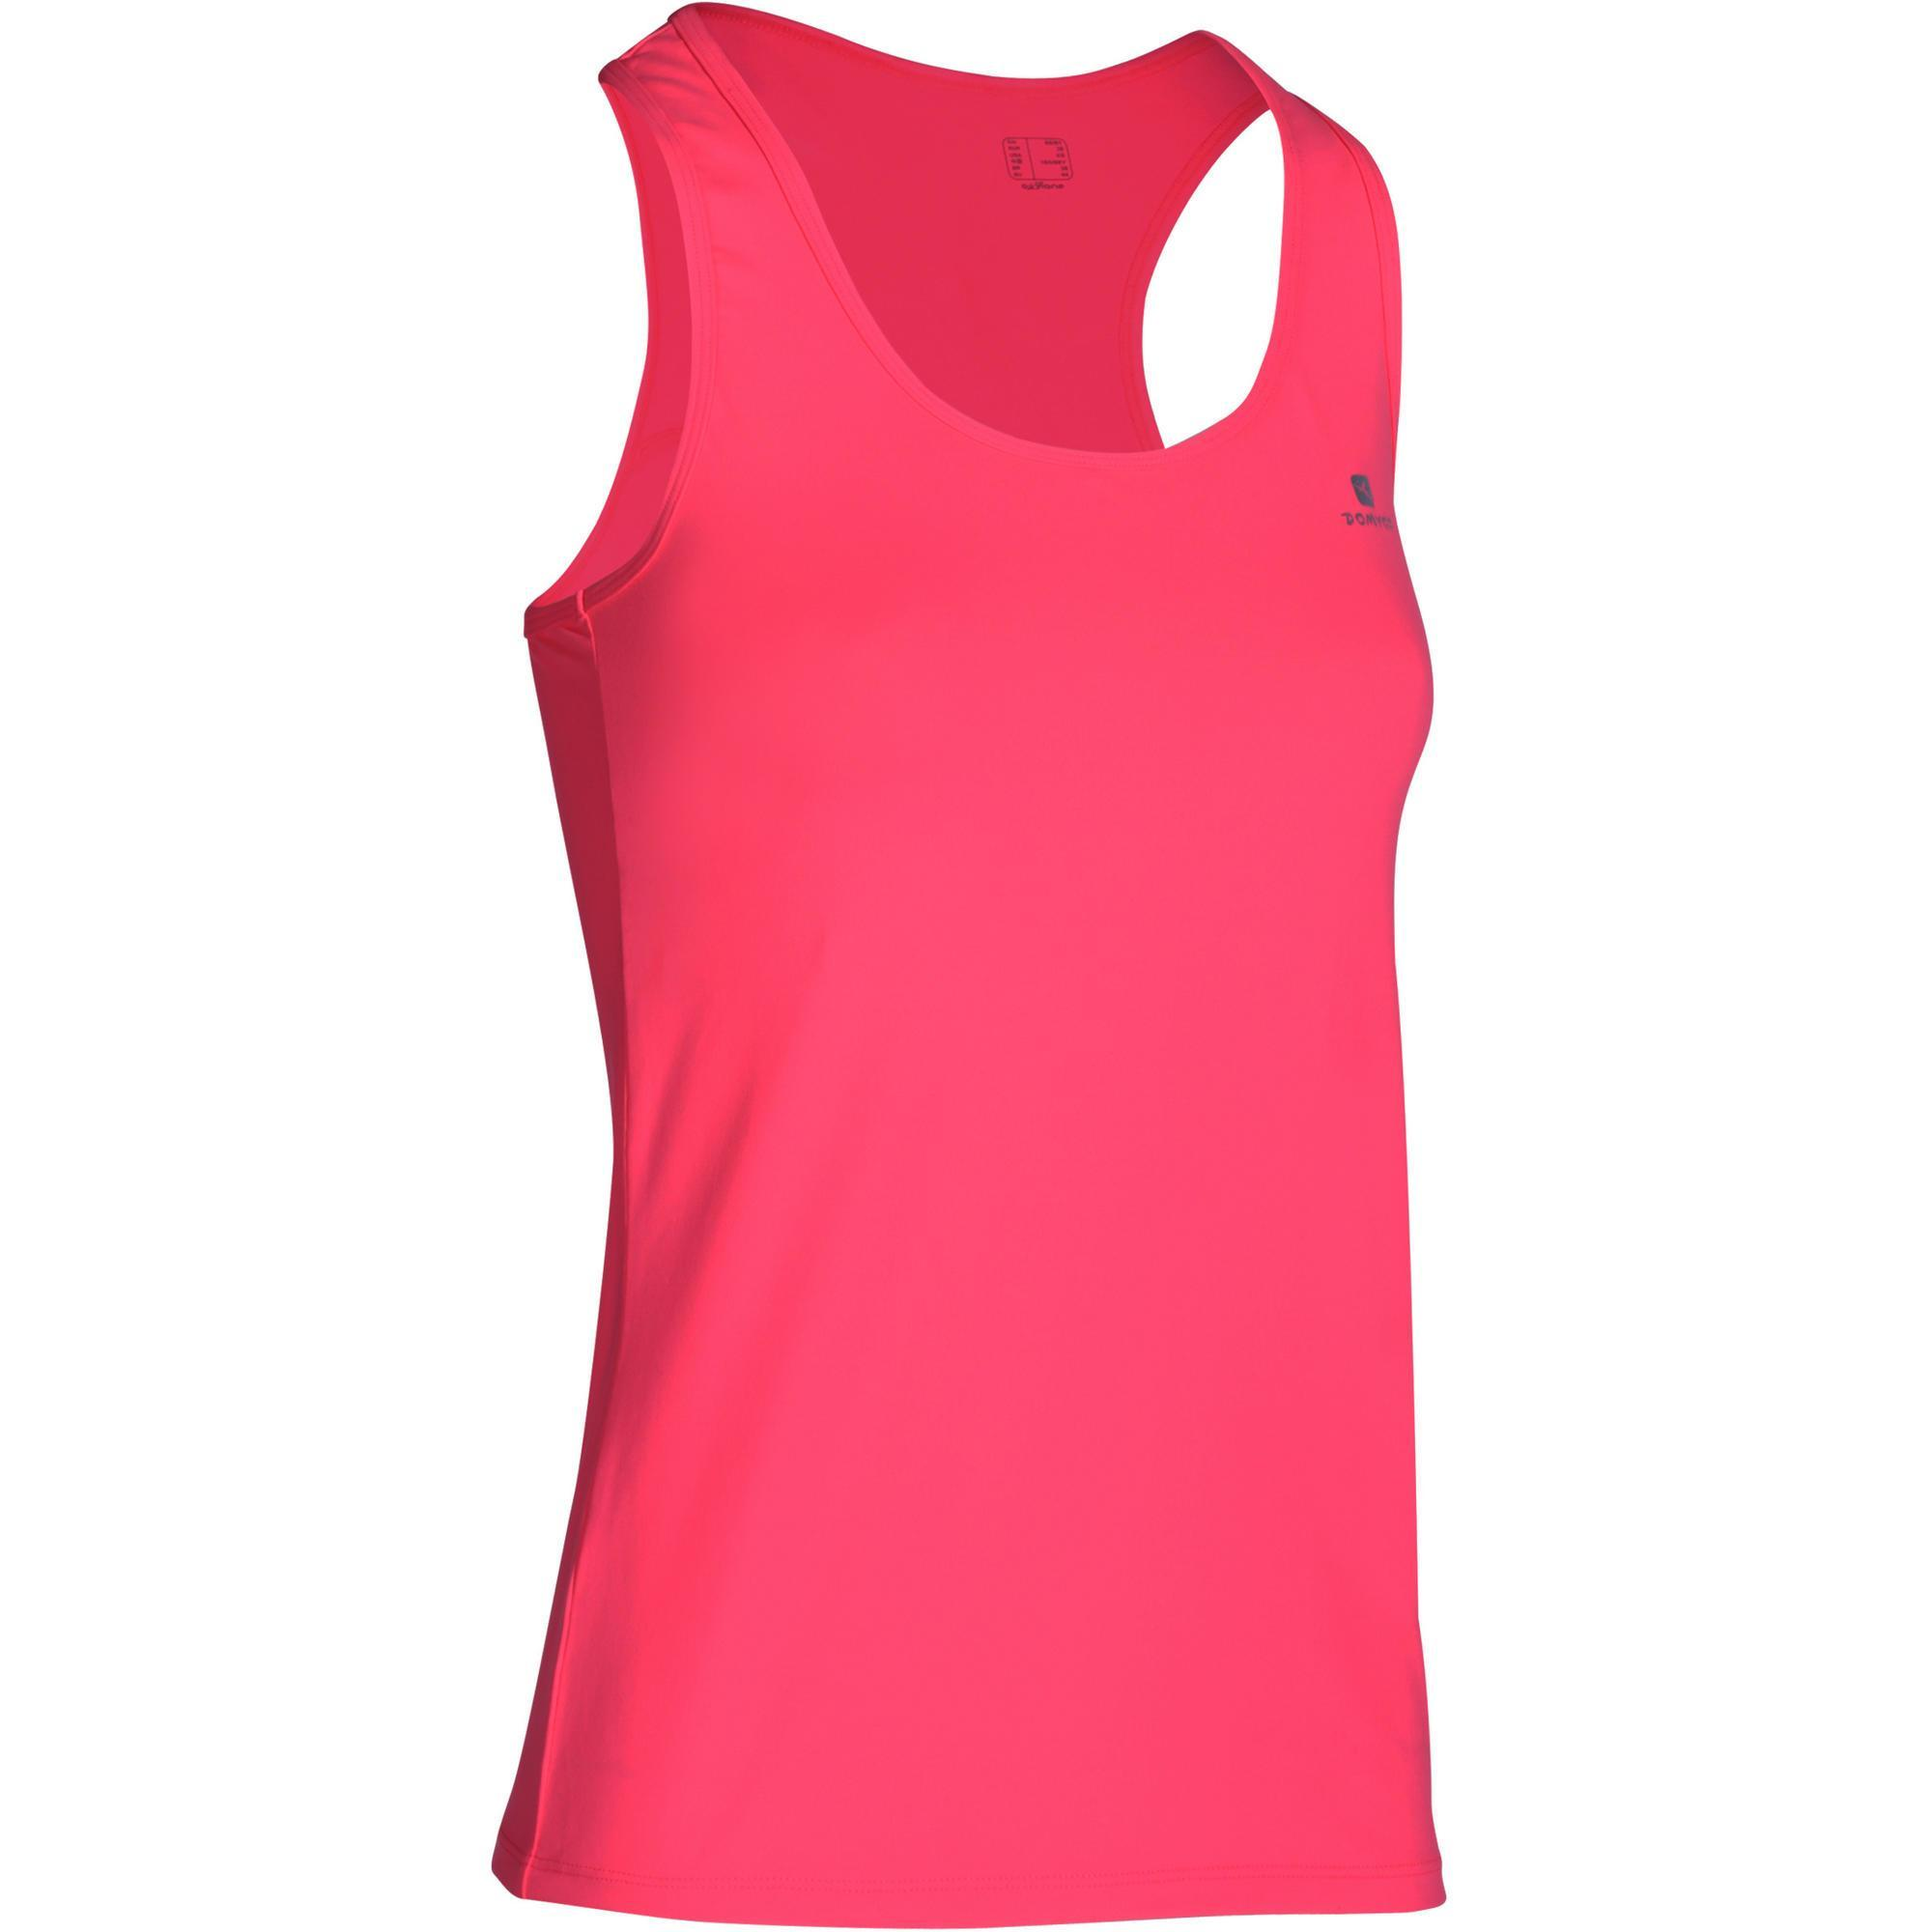 8b210cc9427192 Neon Colors Women s Tank Tops - CafePress